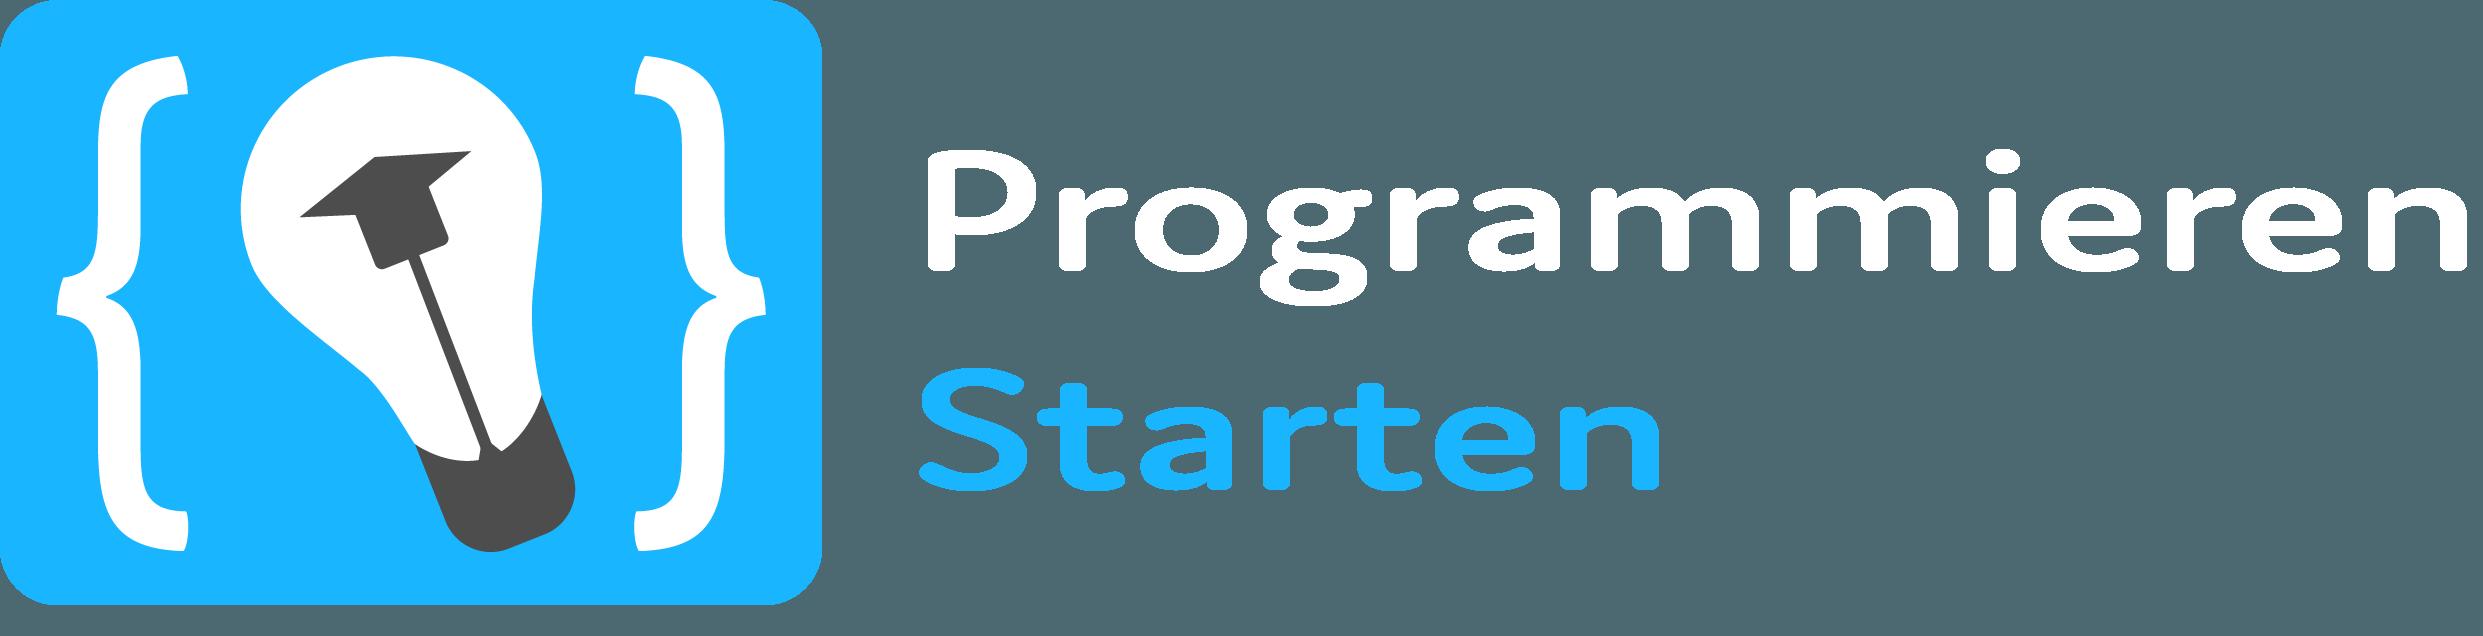 programmieren-starten.de